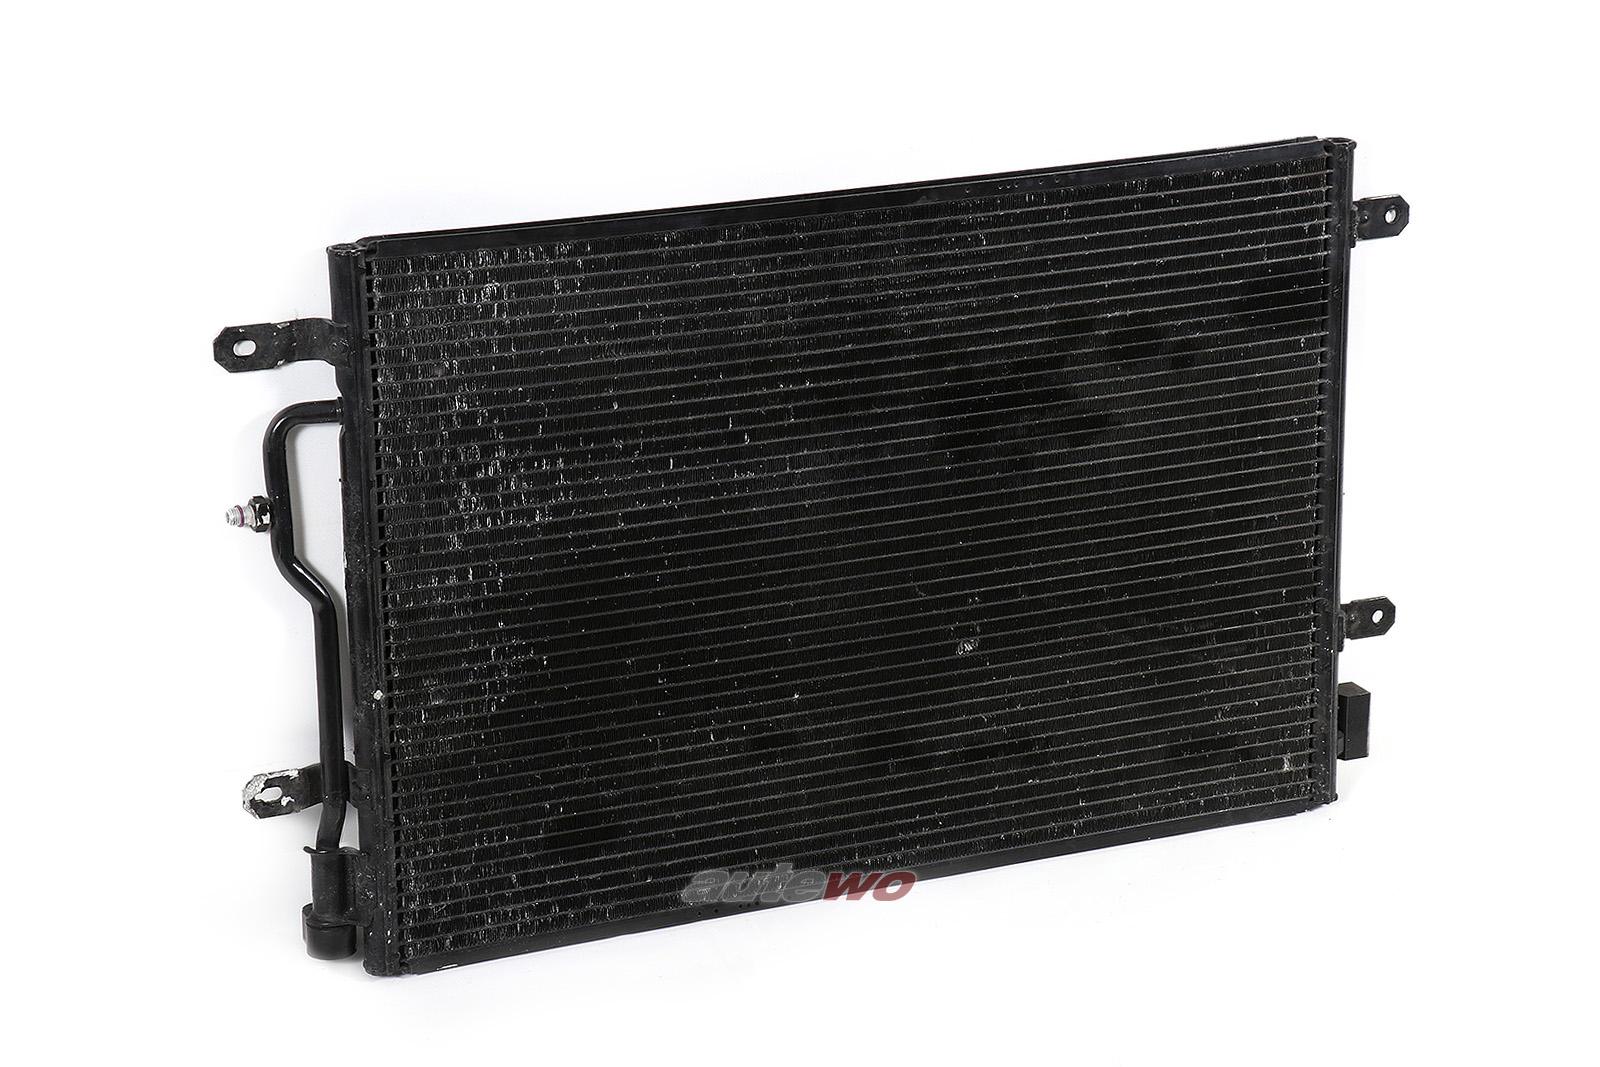 8E0260401B 8E0260403B Audi A4 8E/B6/Cabrio 8H/A6/S6/Allroad 4B Klimakondensator